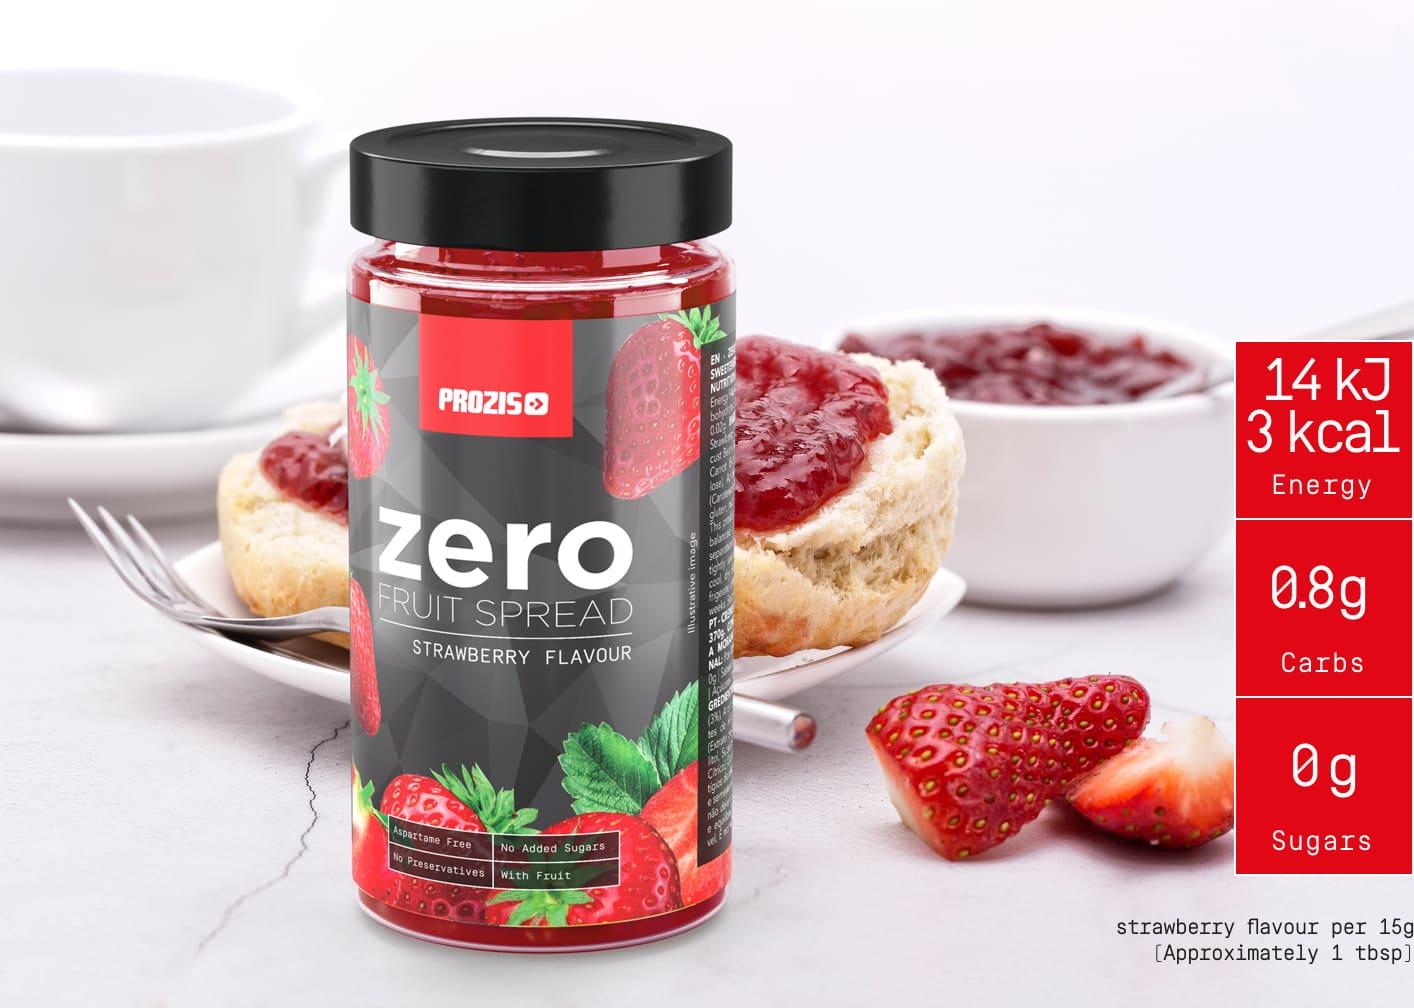 prozis-zero-fruit-spread-strawberry-header_1414x1008_431578_475312.jpg